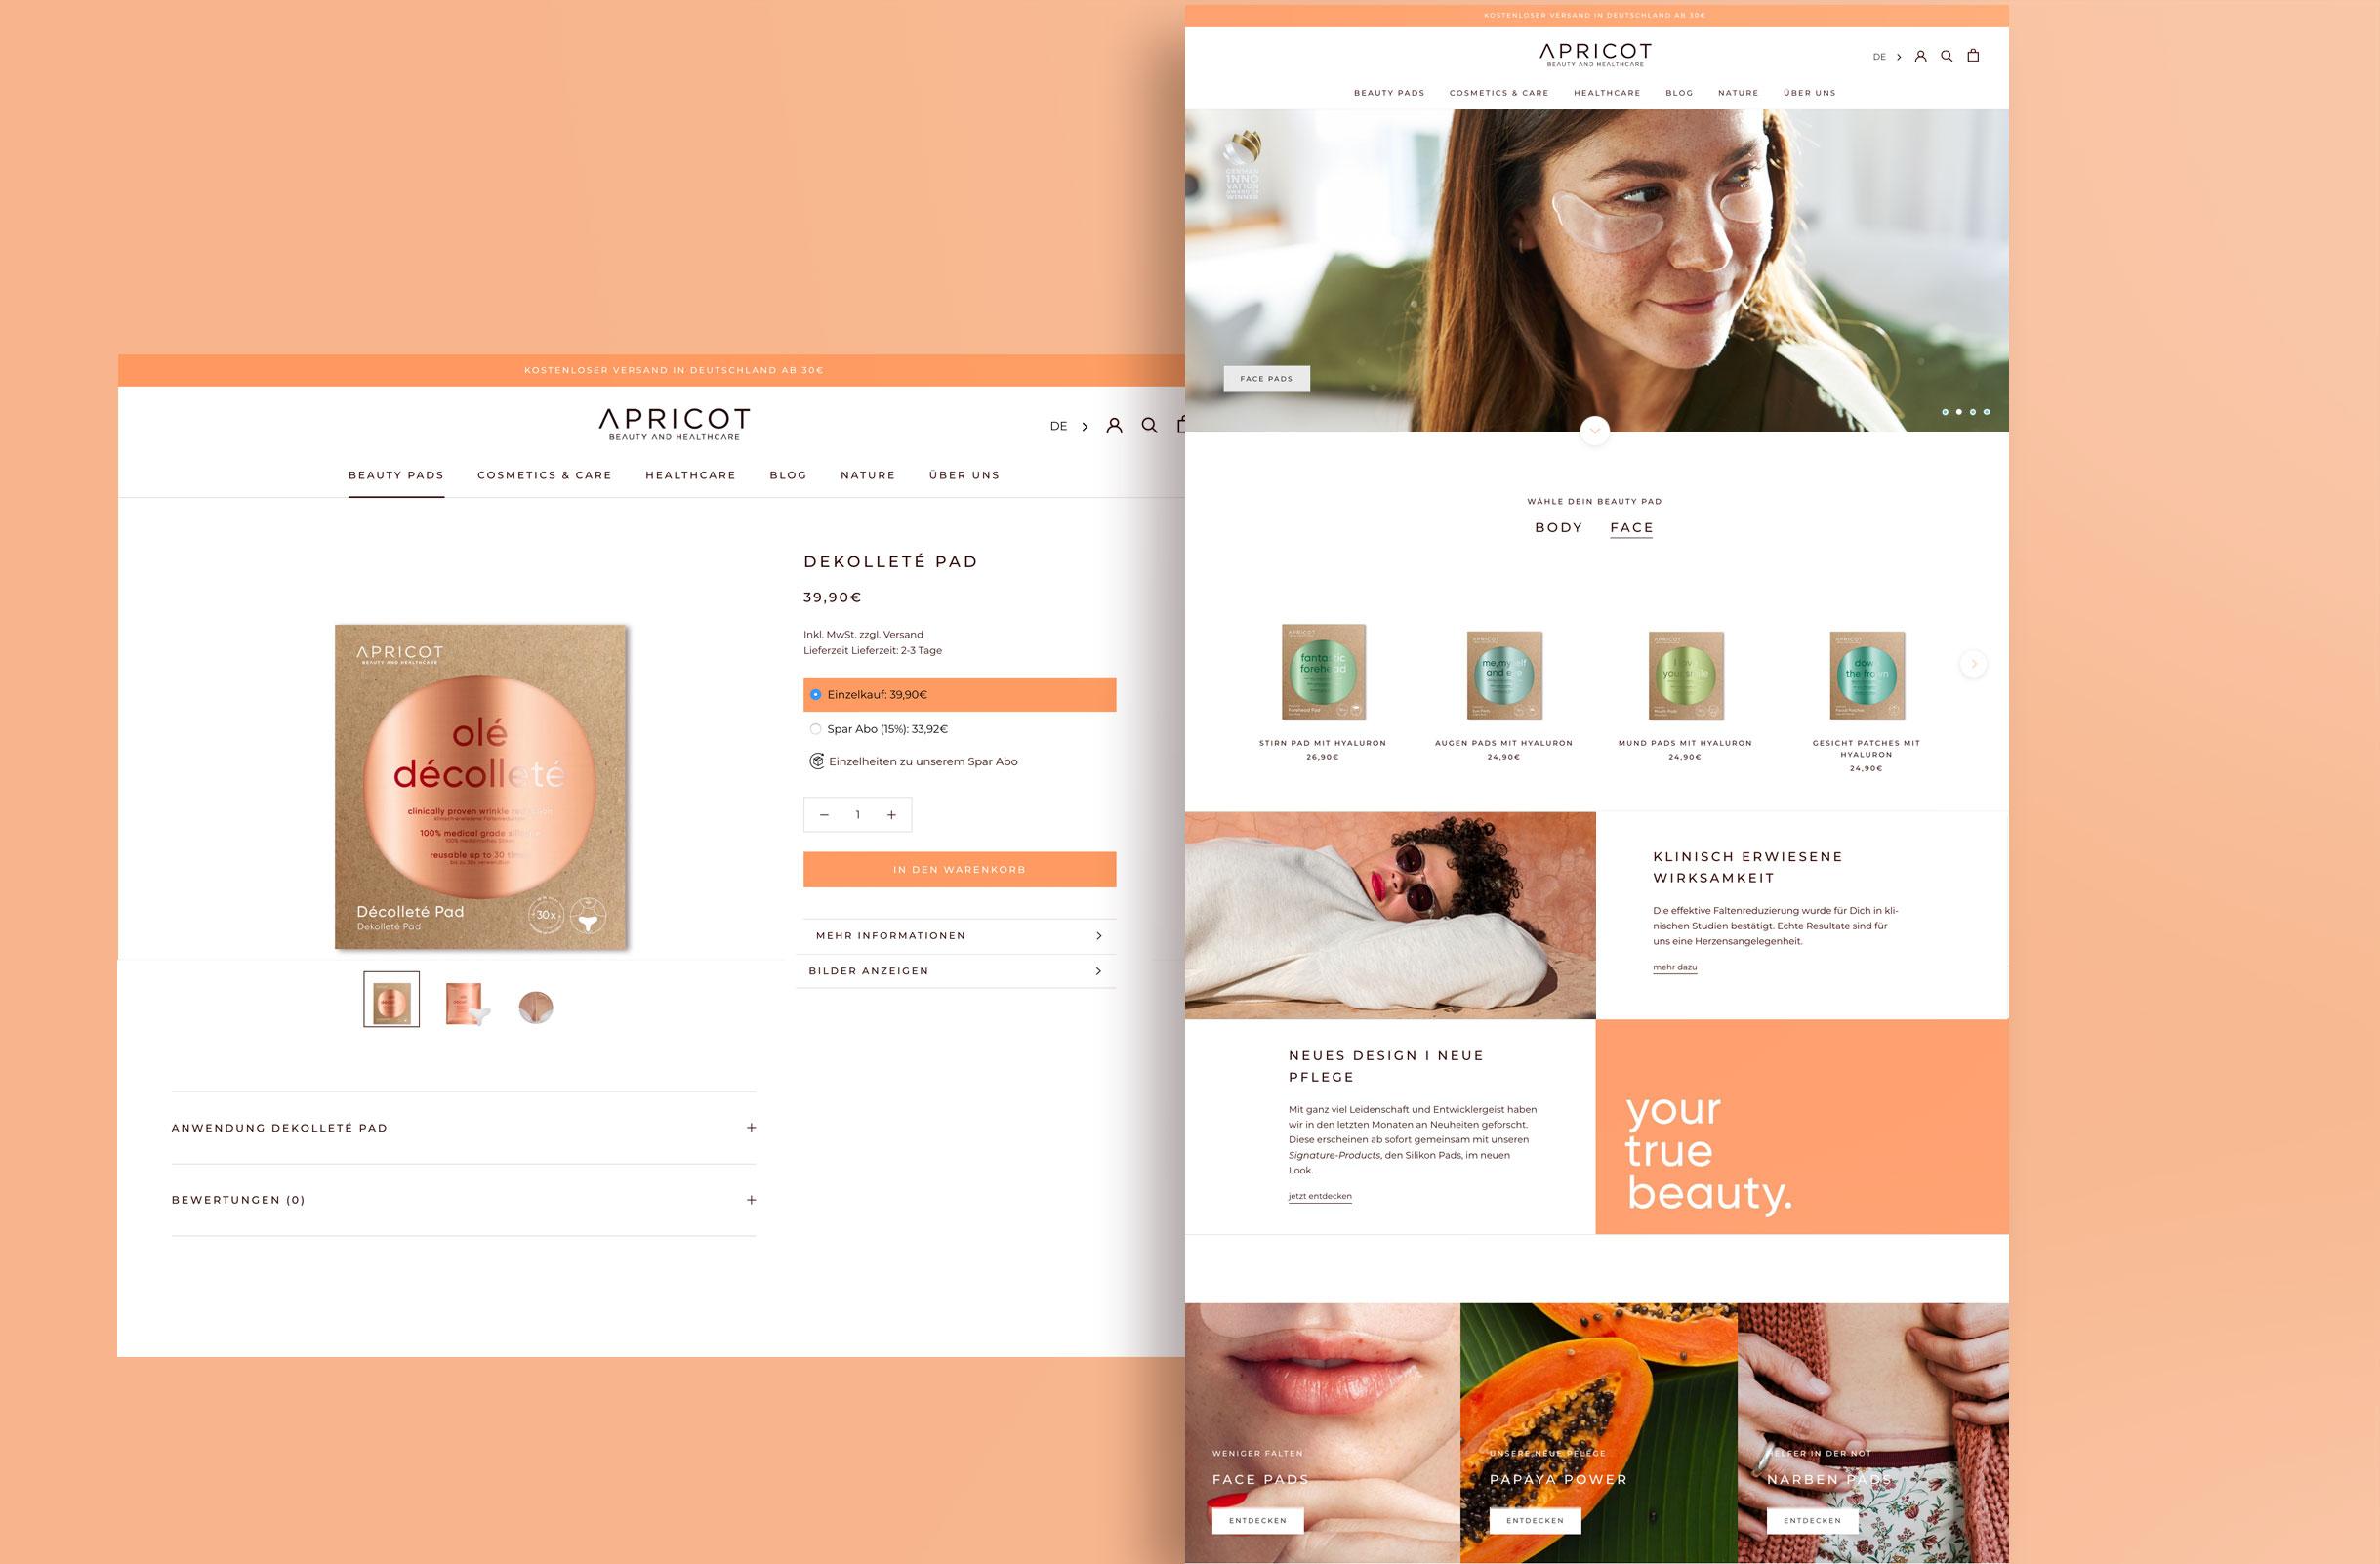 Apricot_Beauty_Claudia_Nothhelfer_Web